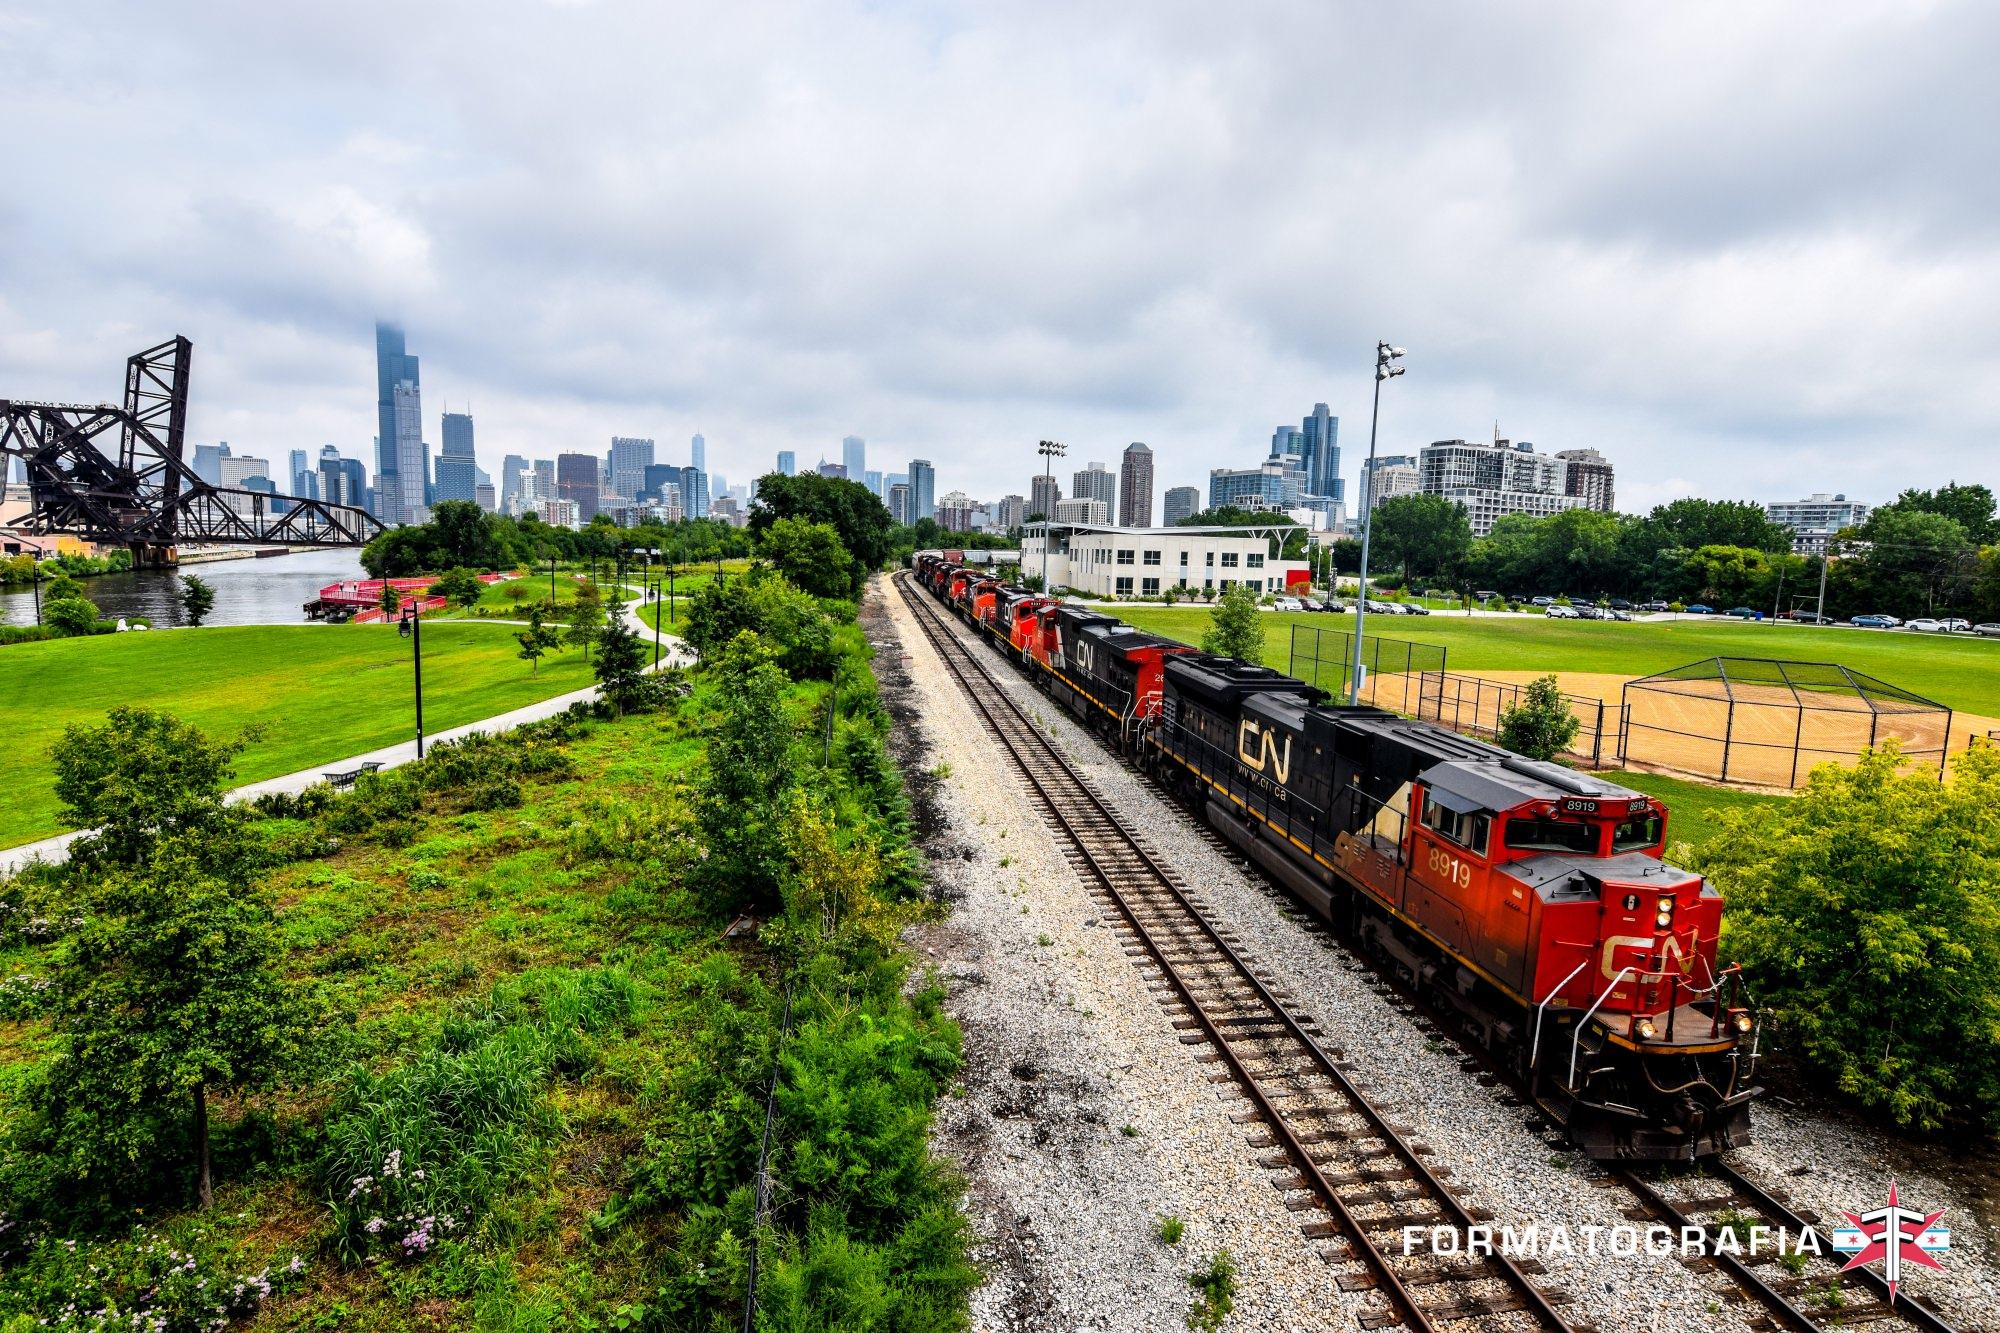 eric formato chicago photographer fall update city architecture shotsDSC_0208.jpg